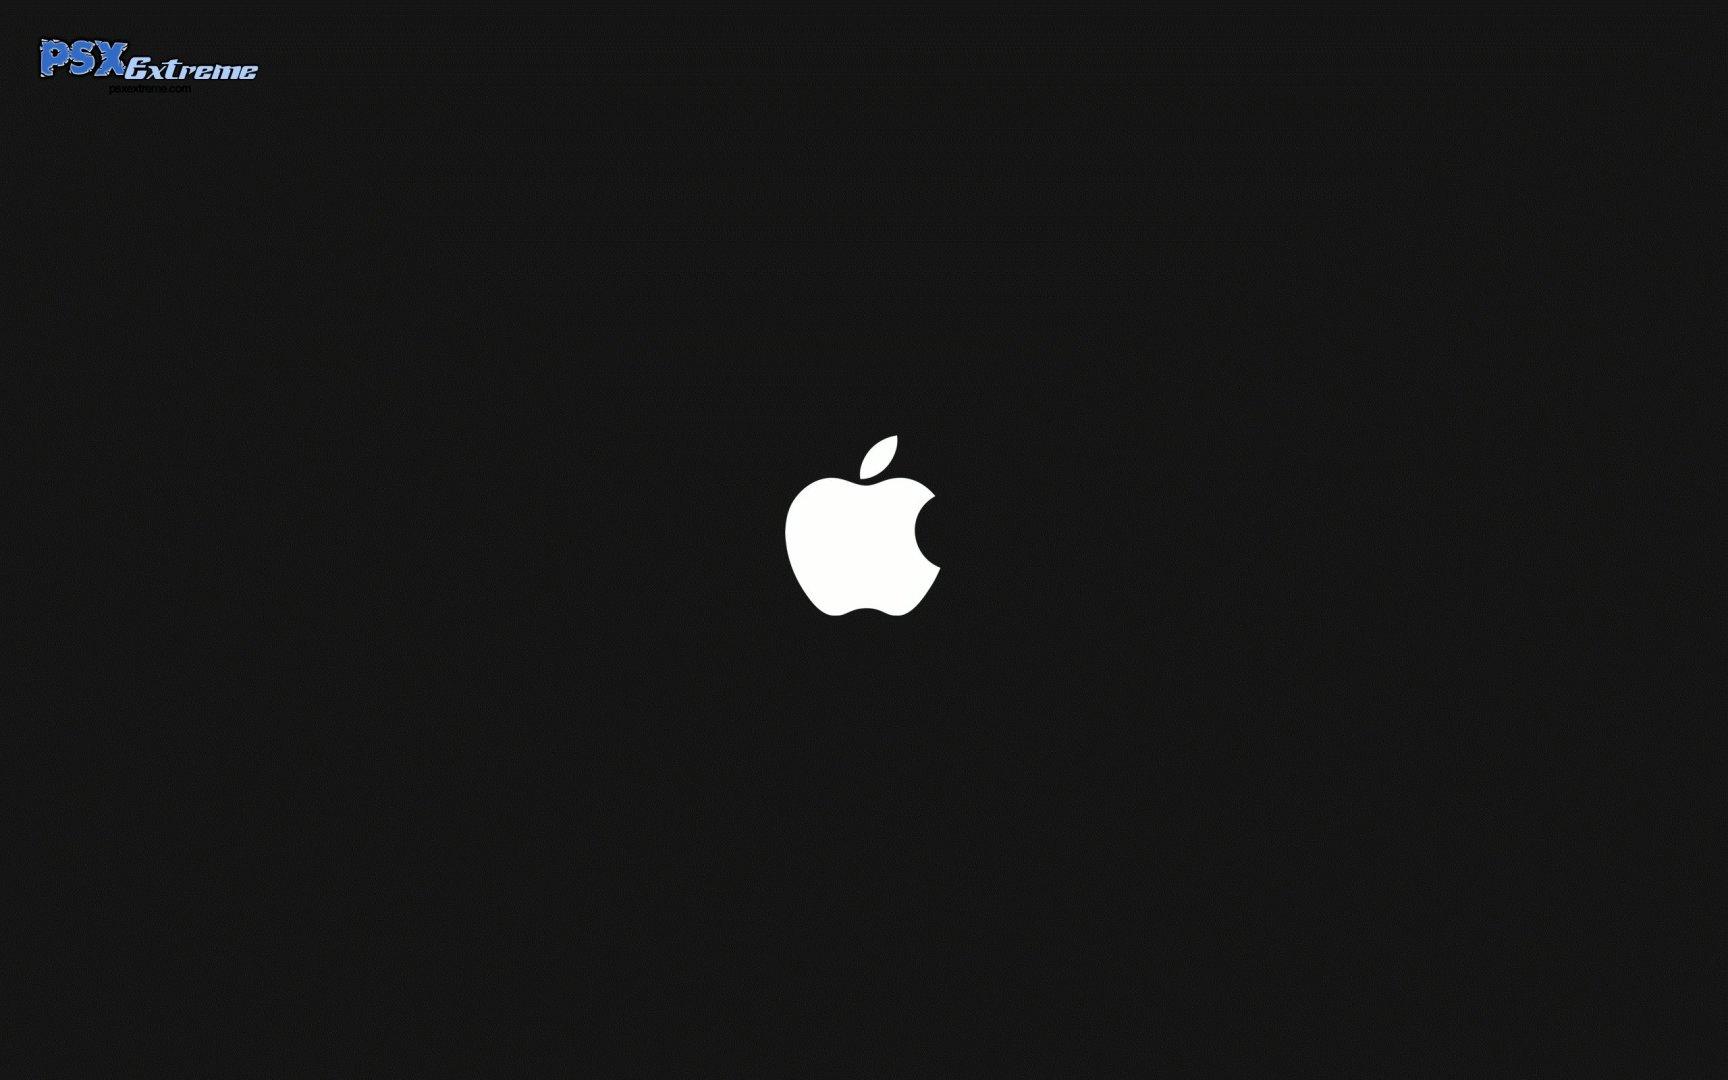 Black White Wallpaper Black Apple Logo Wallpapers 1728x1080